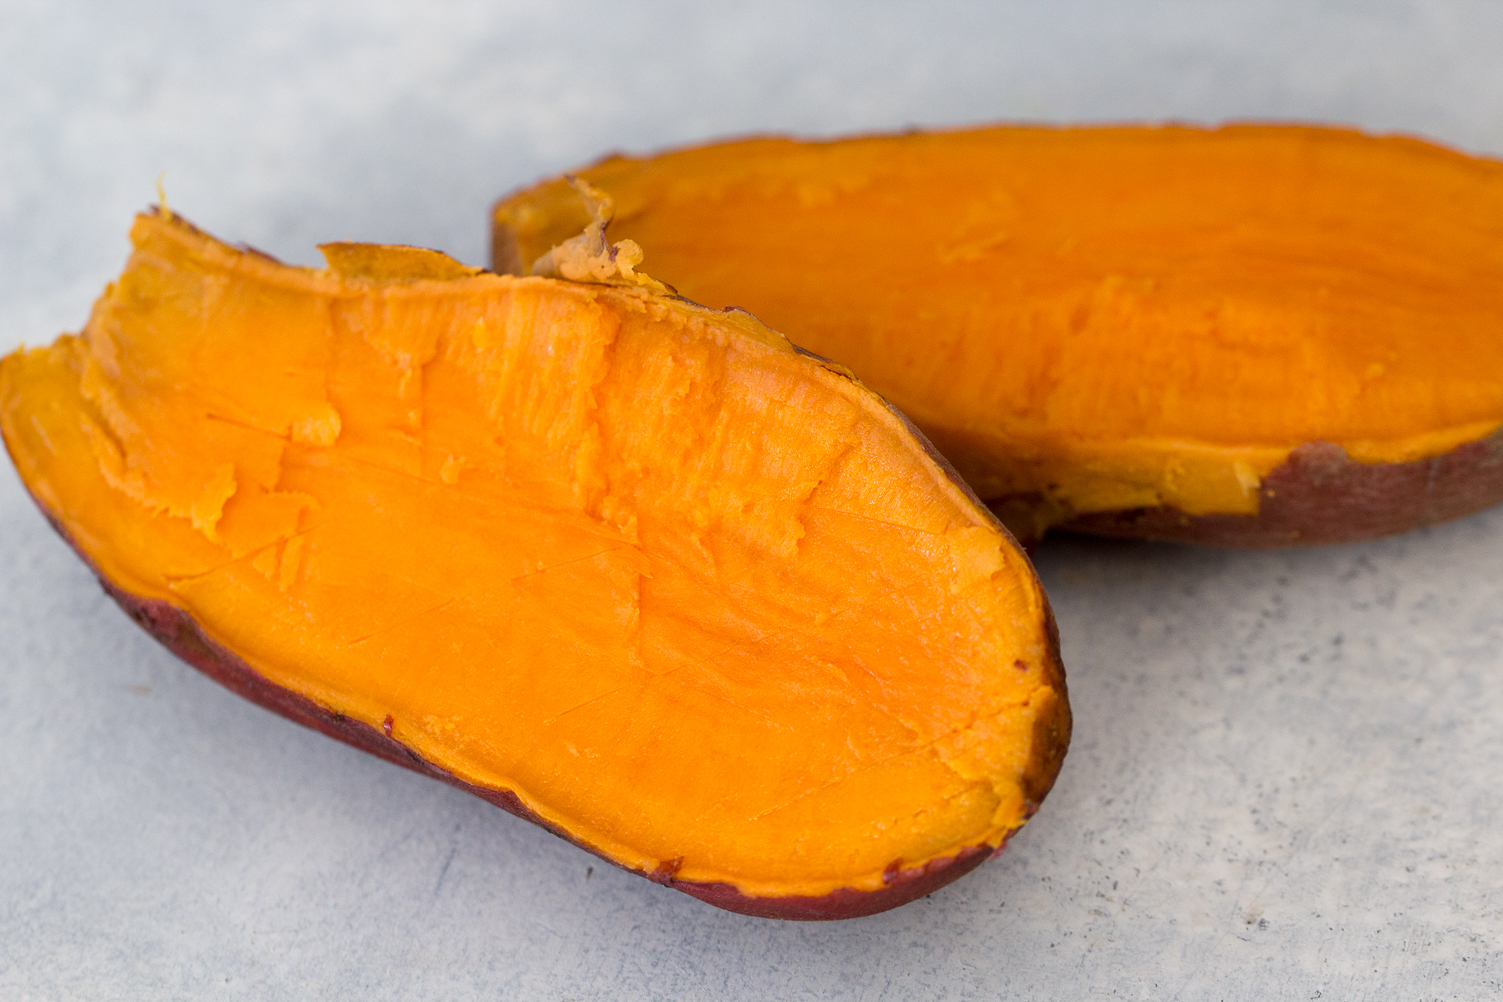 Instant Pot Baked Sweet Potato cut in half